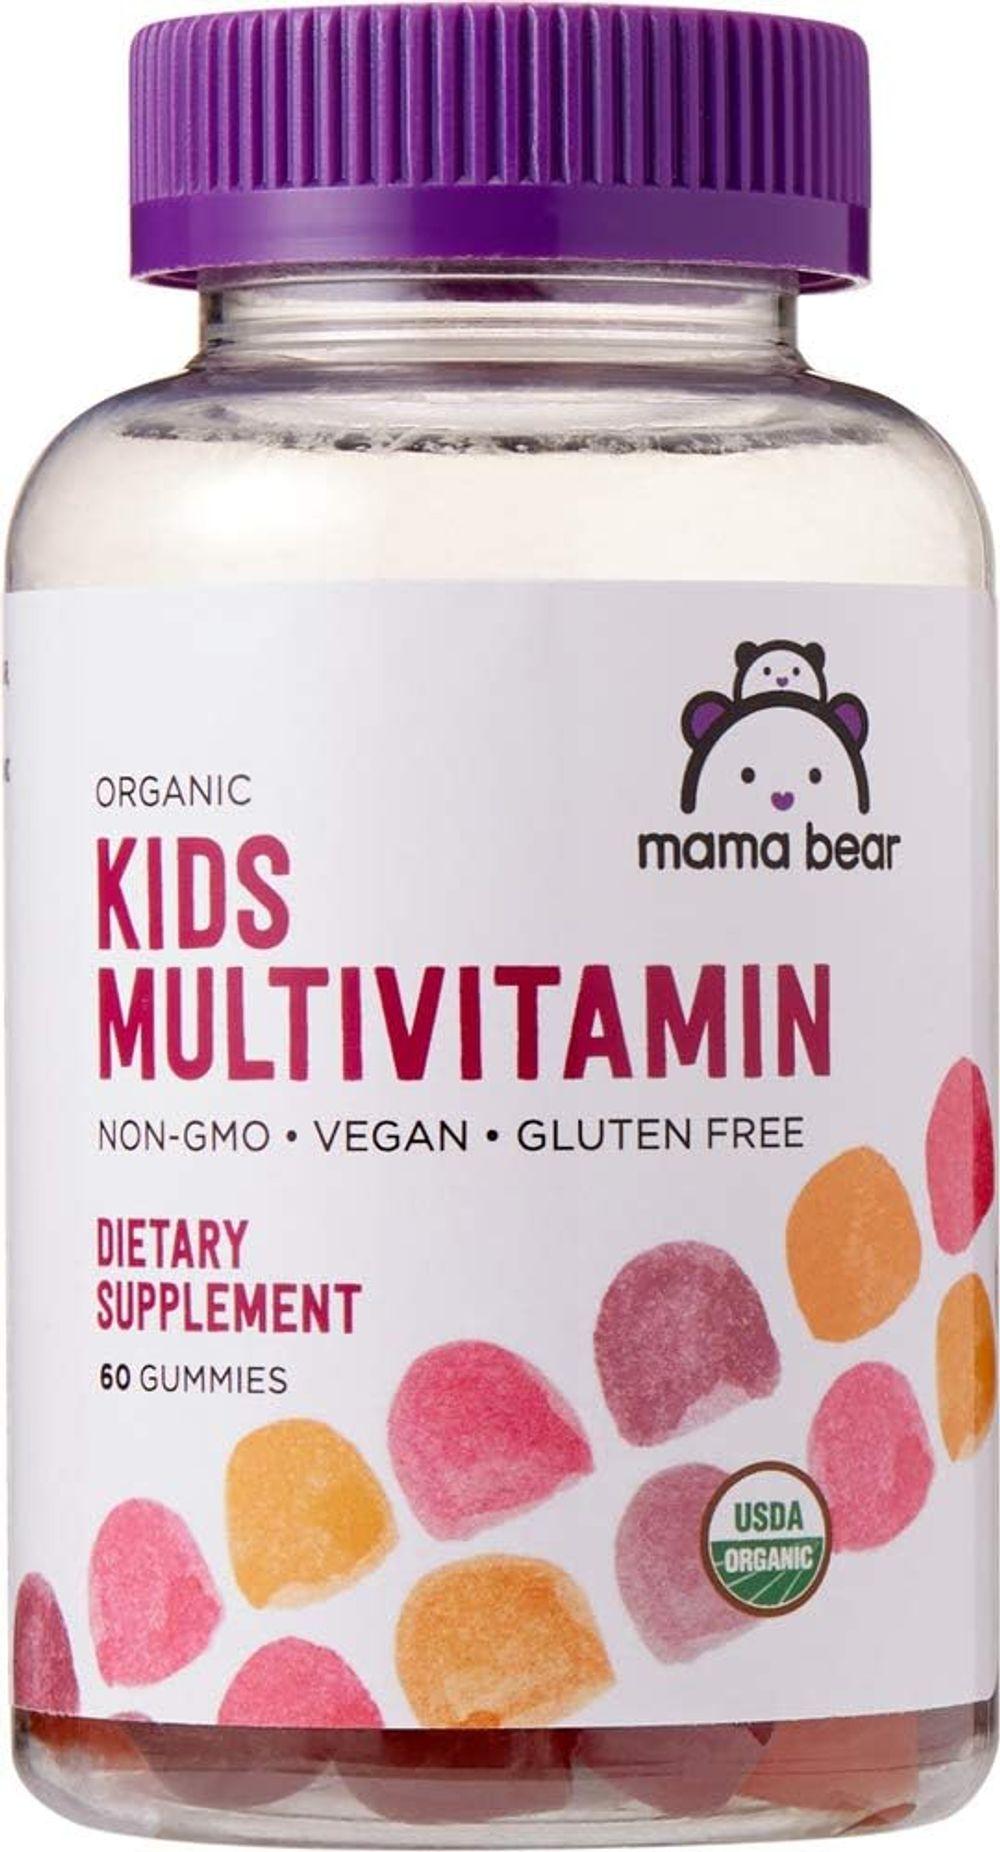 Amazon Brand - Mama Bear Organic Kids Multivitamin, 60 Gummies, 1 Month Supply